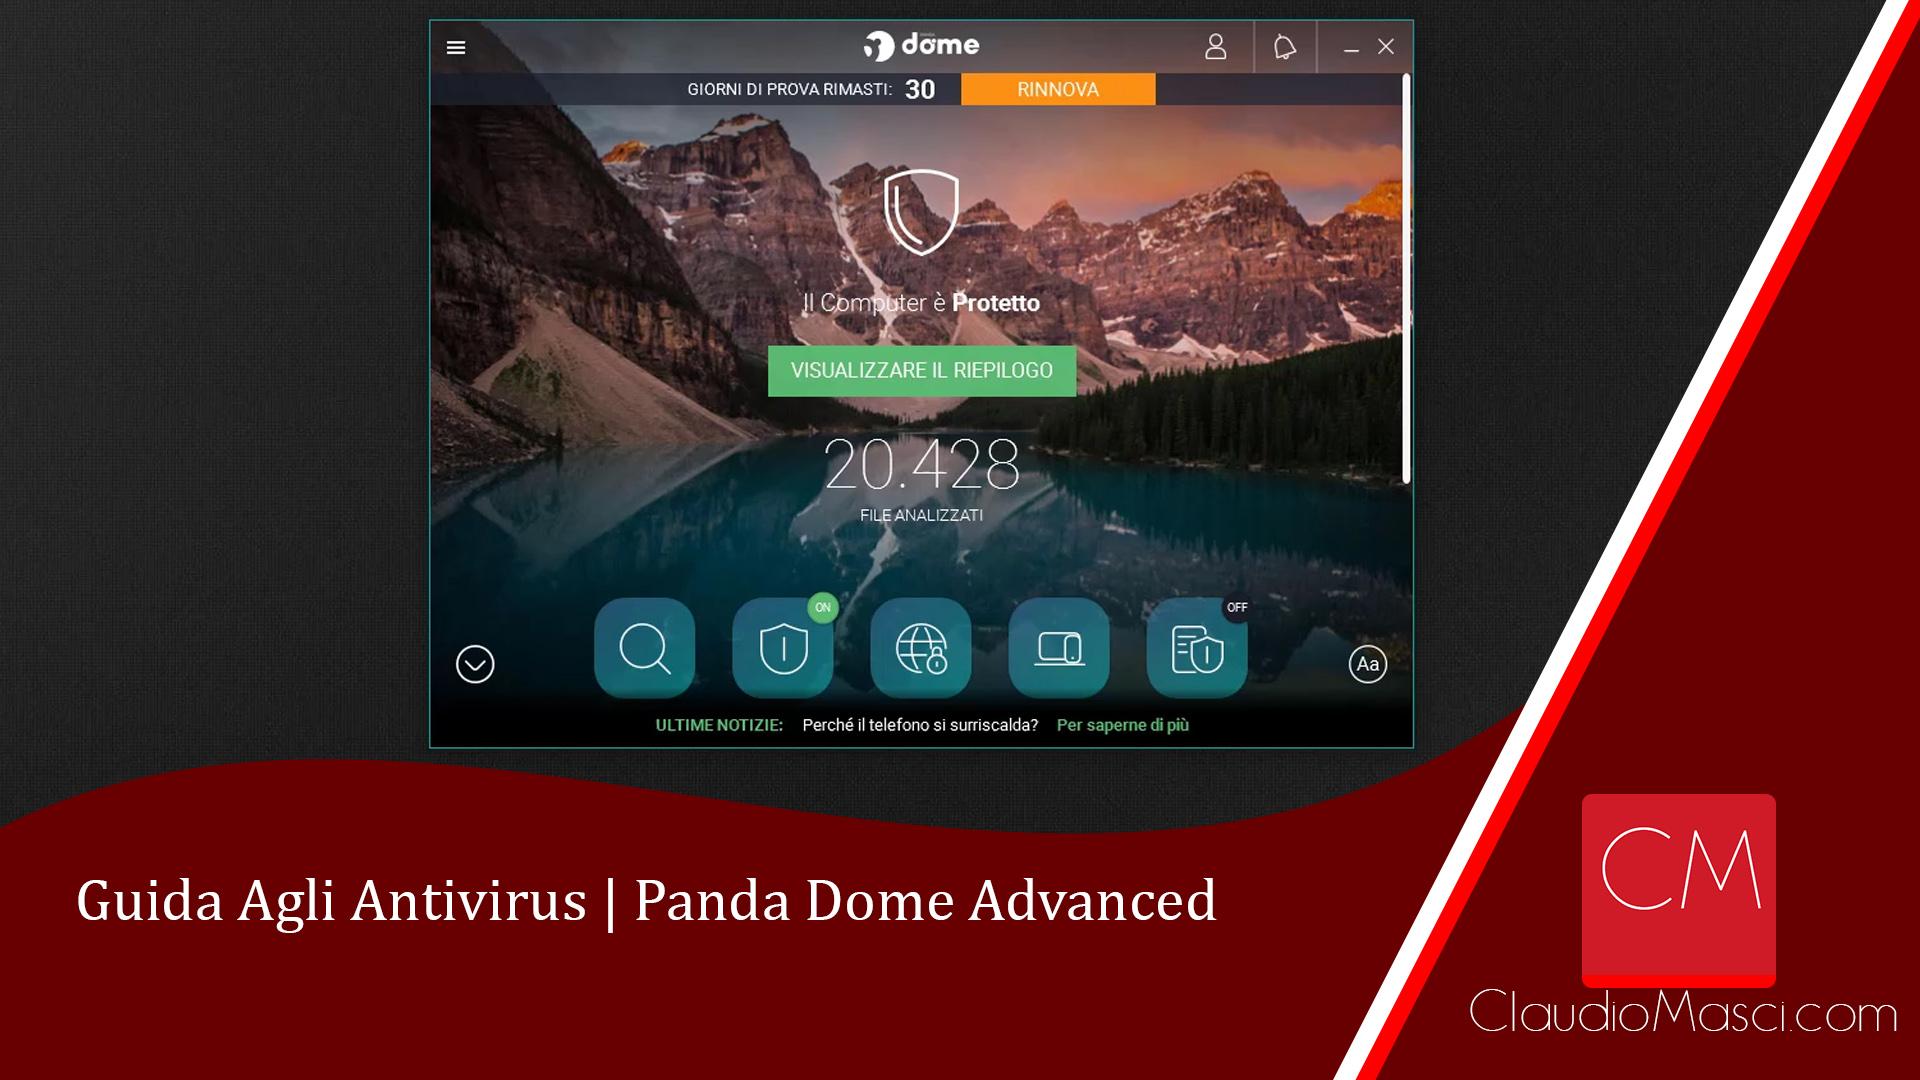 Guida Agli Antivirus | Panda Dome Advanced